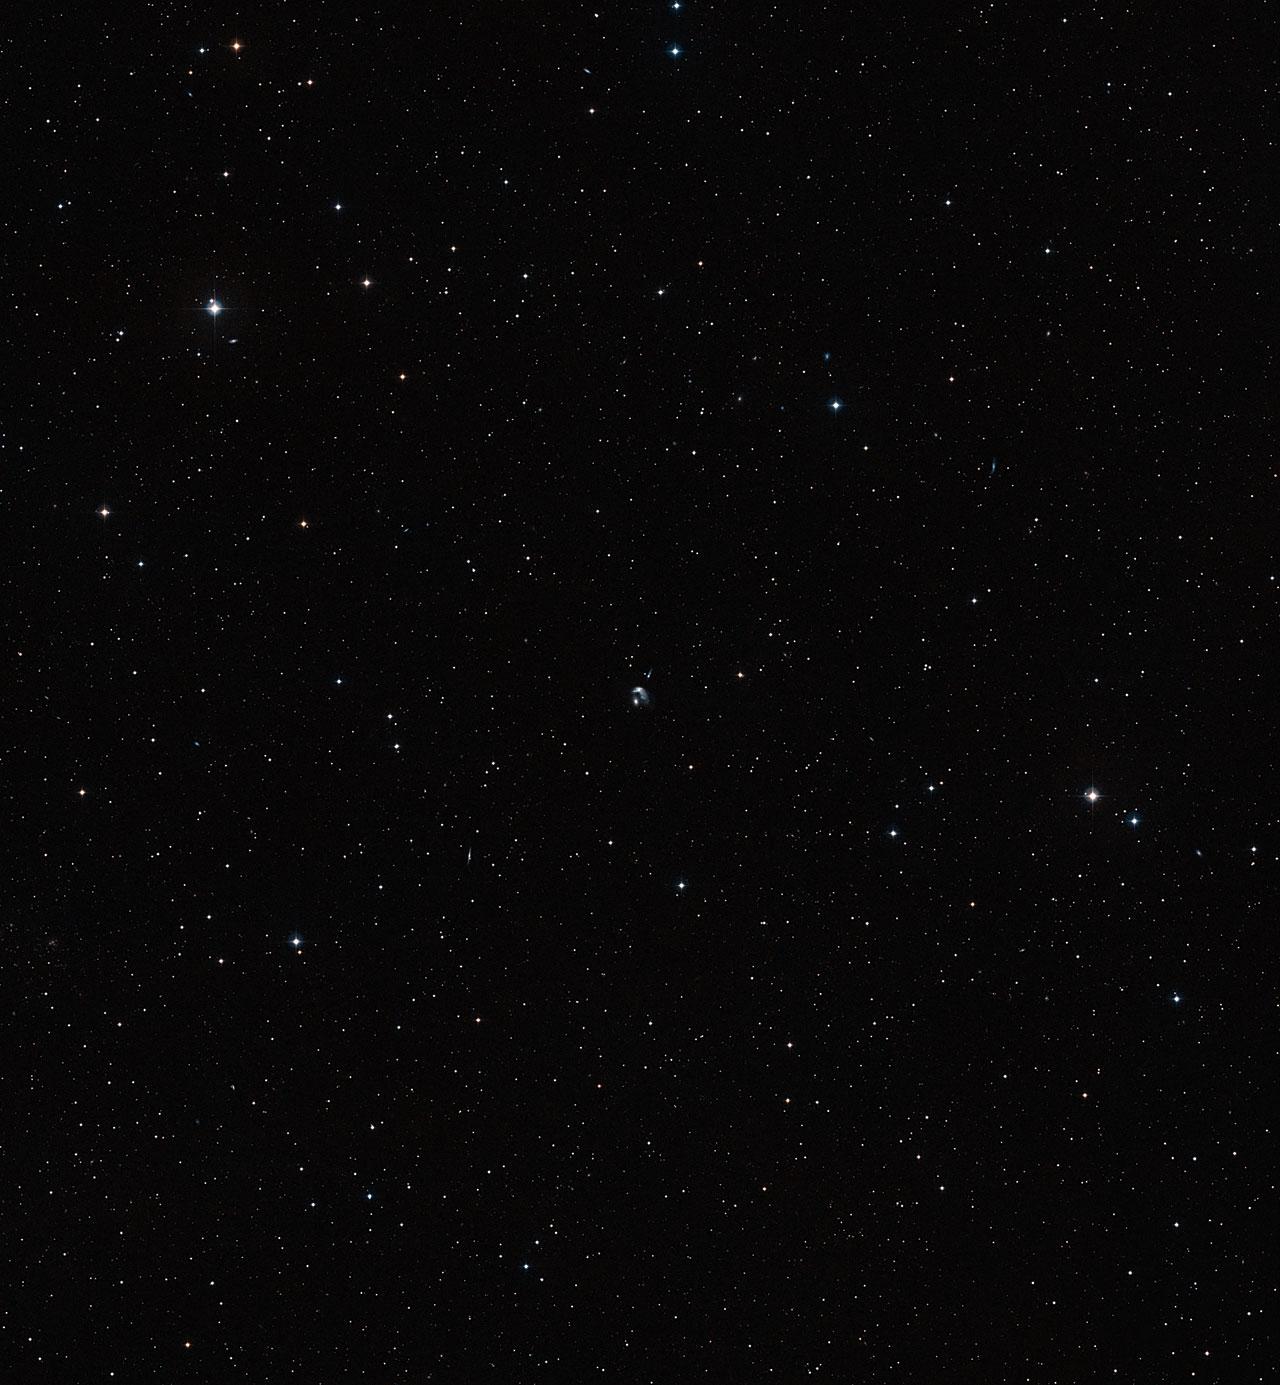 The area around merging galaxy duo Arp 142 (ground-based image)